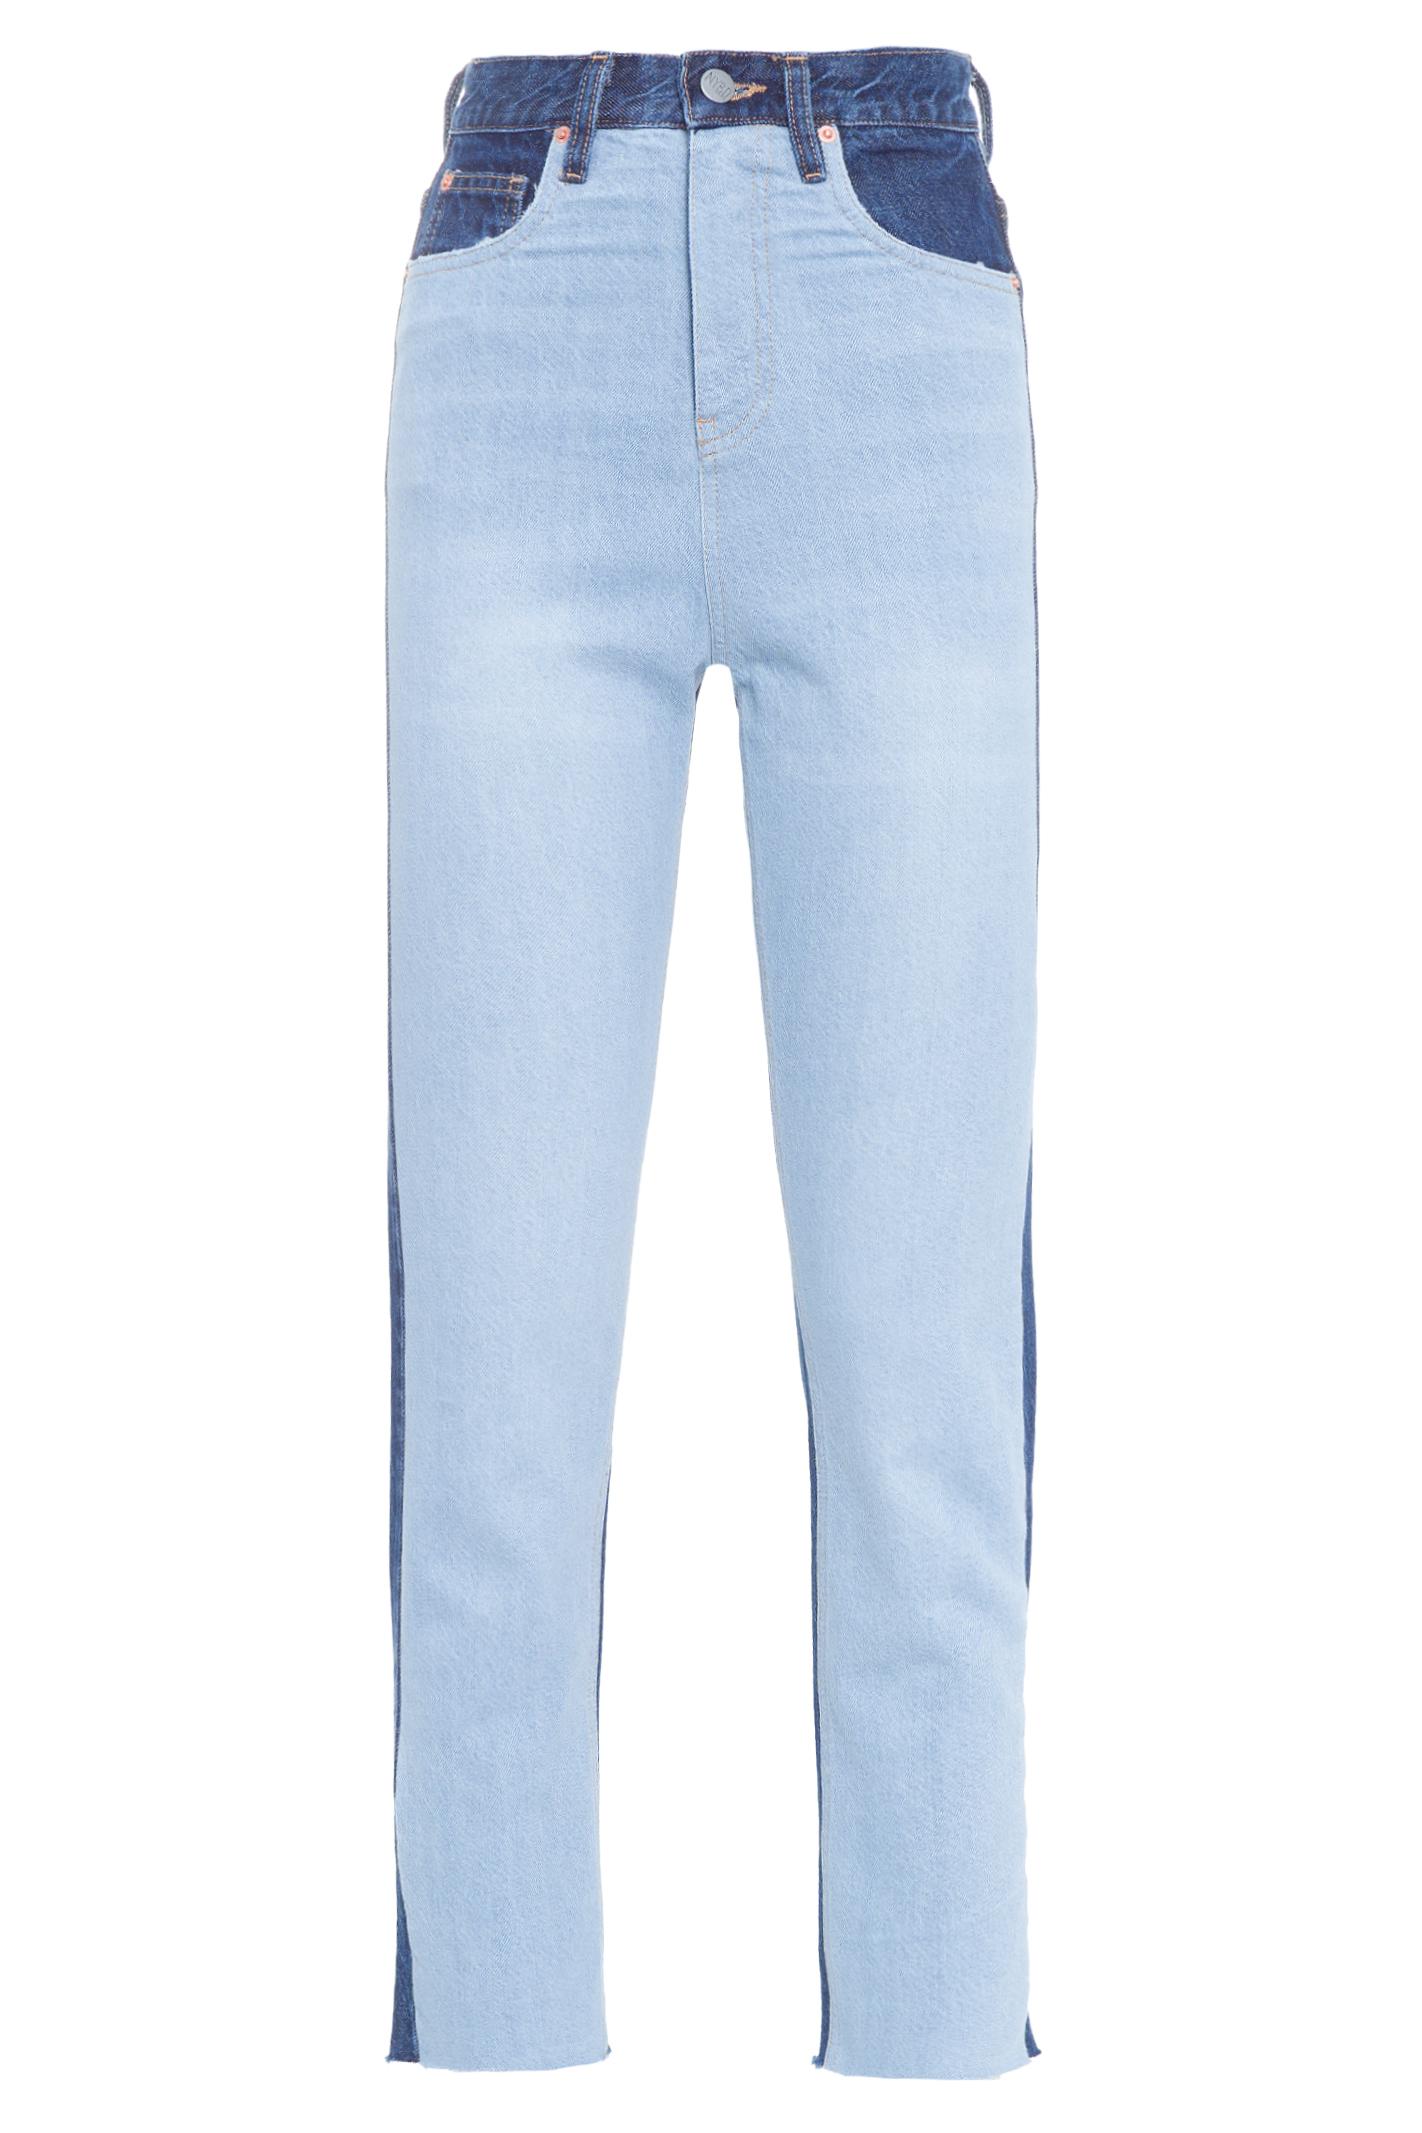 Calça Skinny Bicolor Jeans